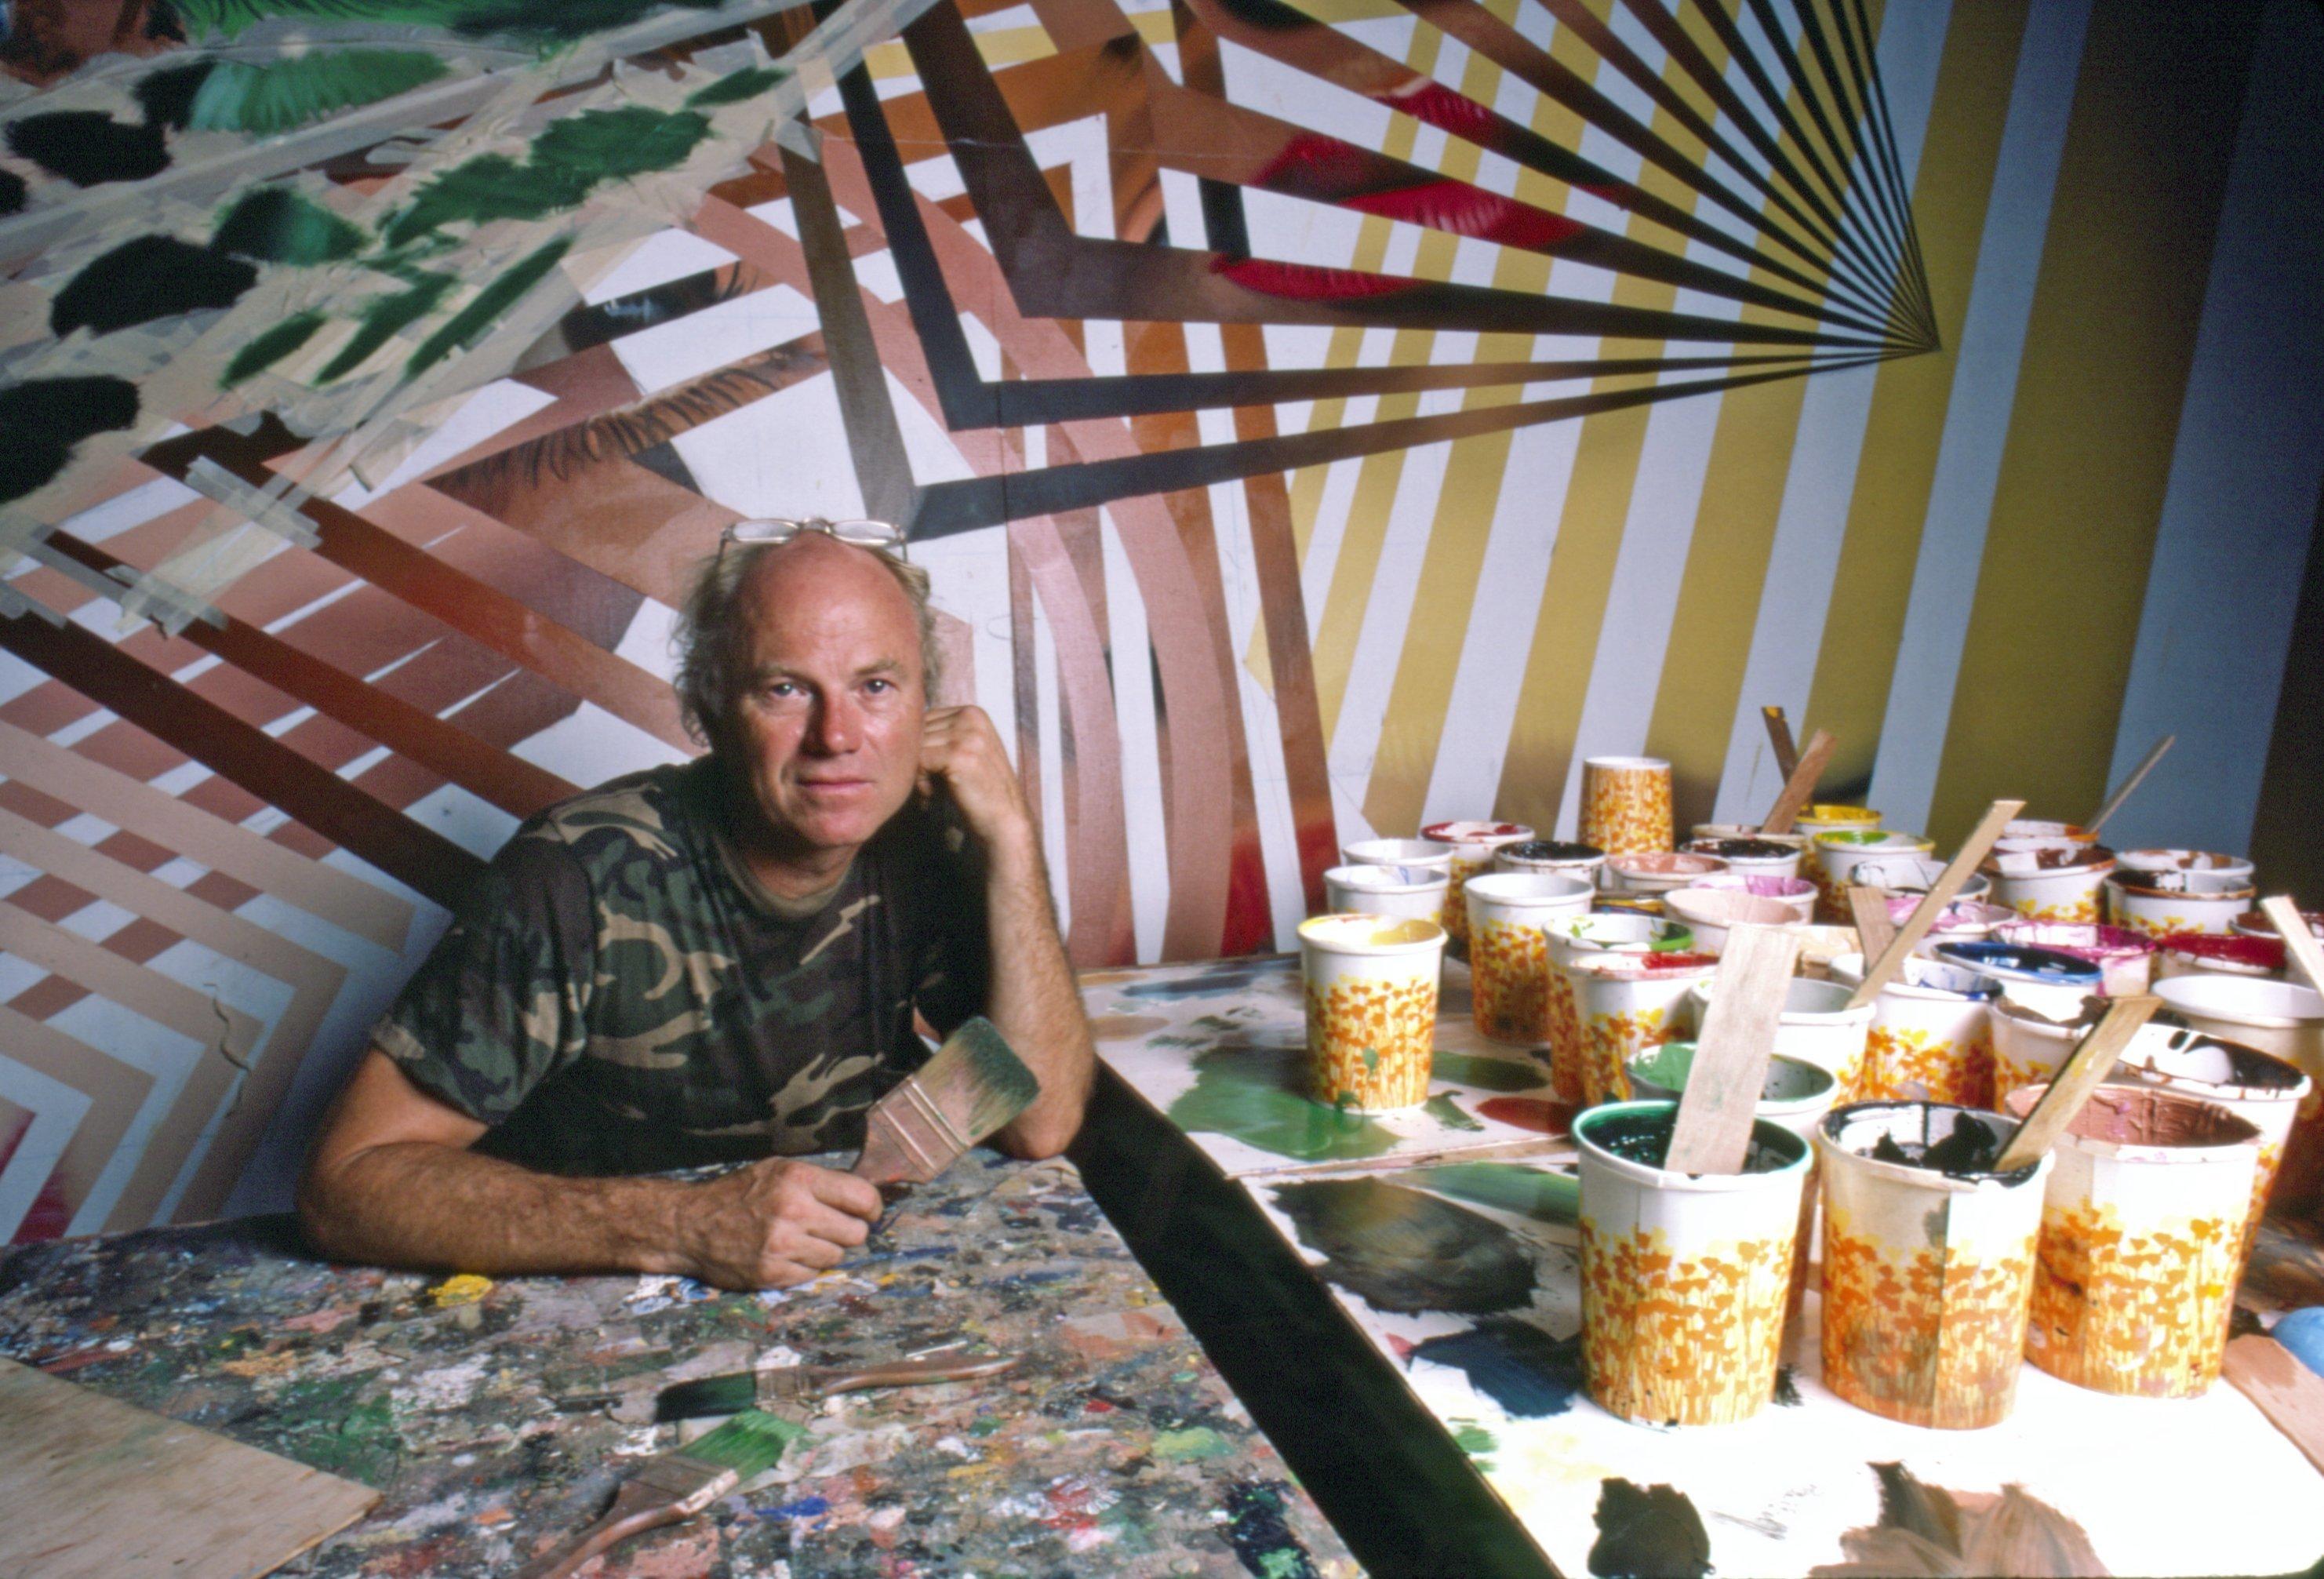 James Rosenquist at work in his studio in Florida in 1986.